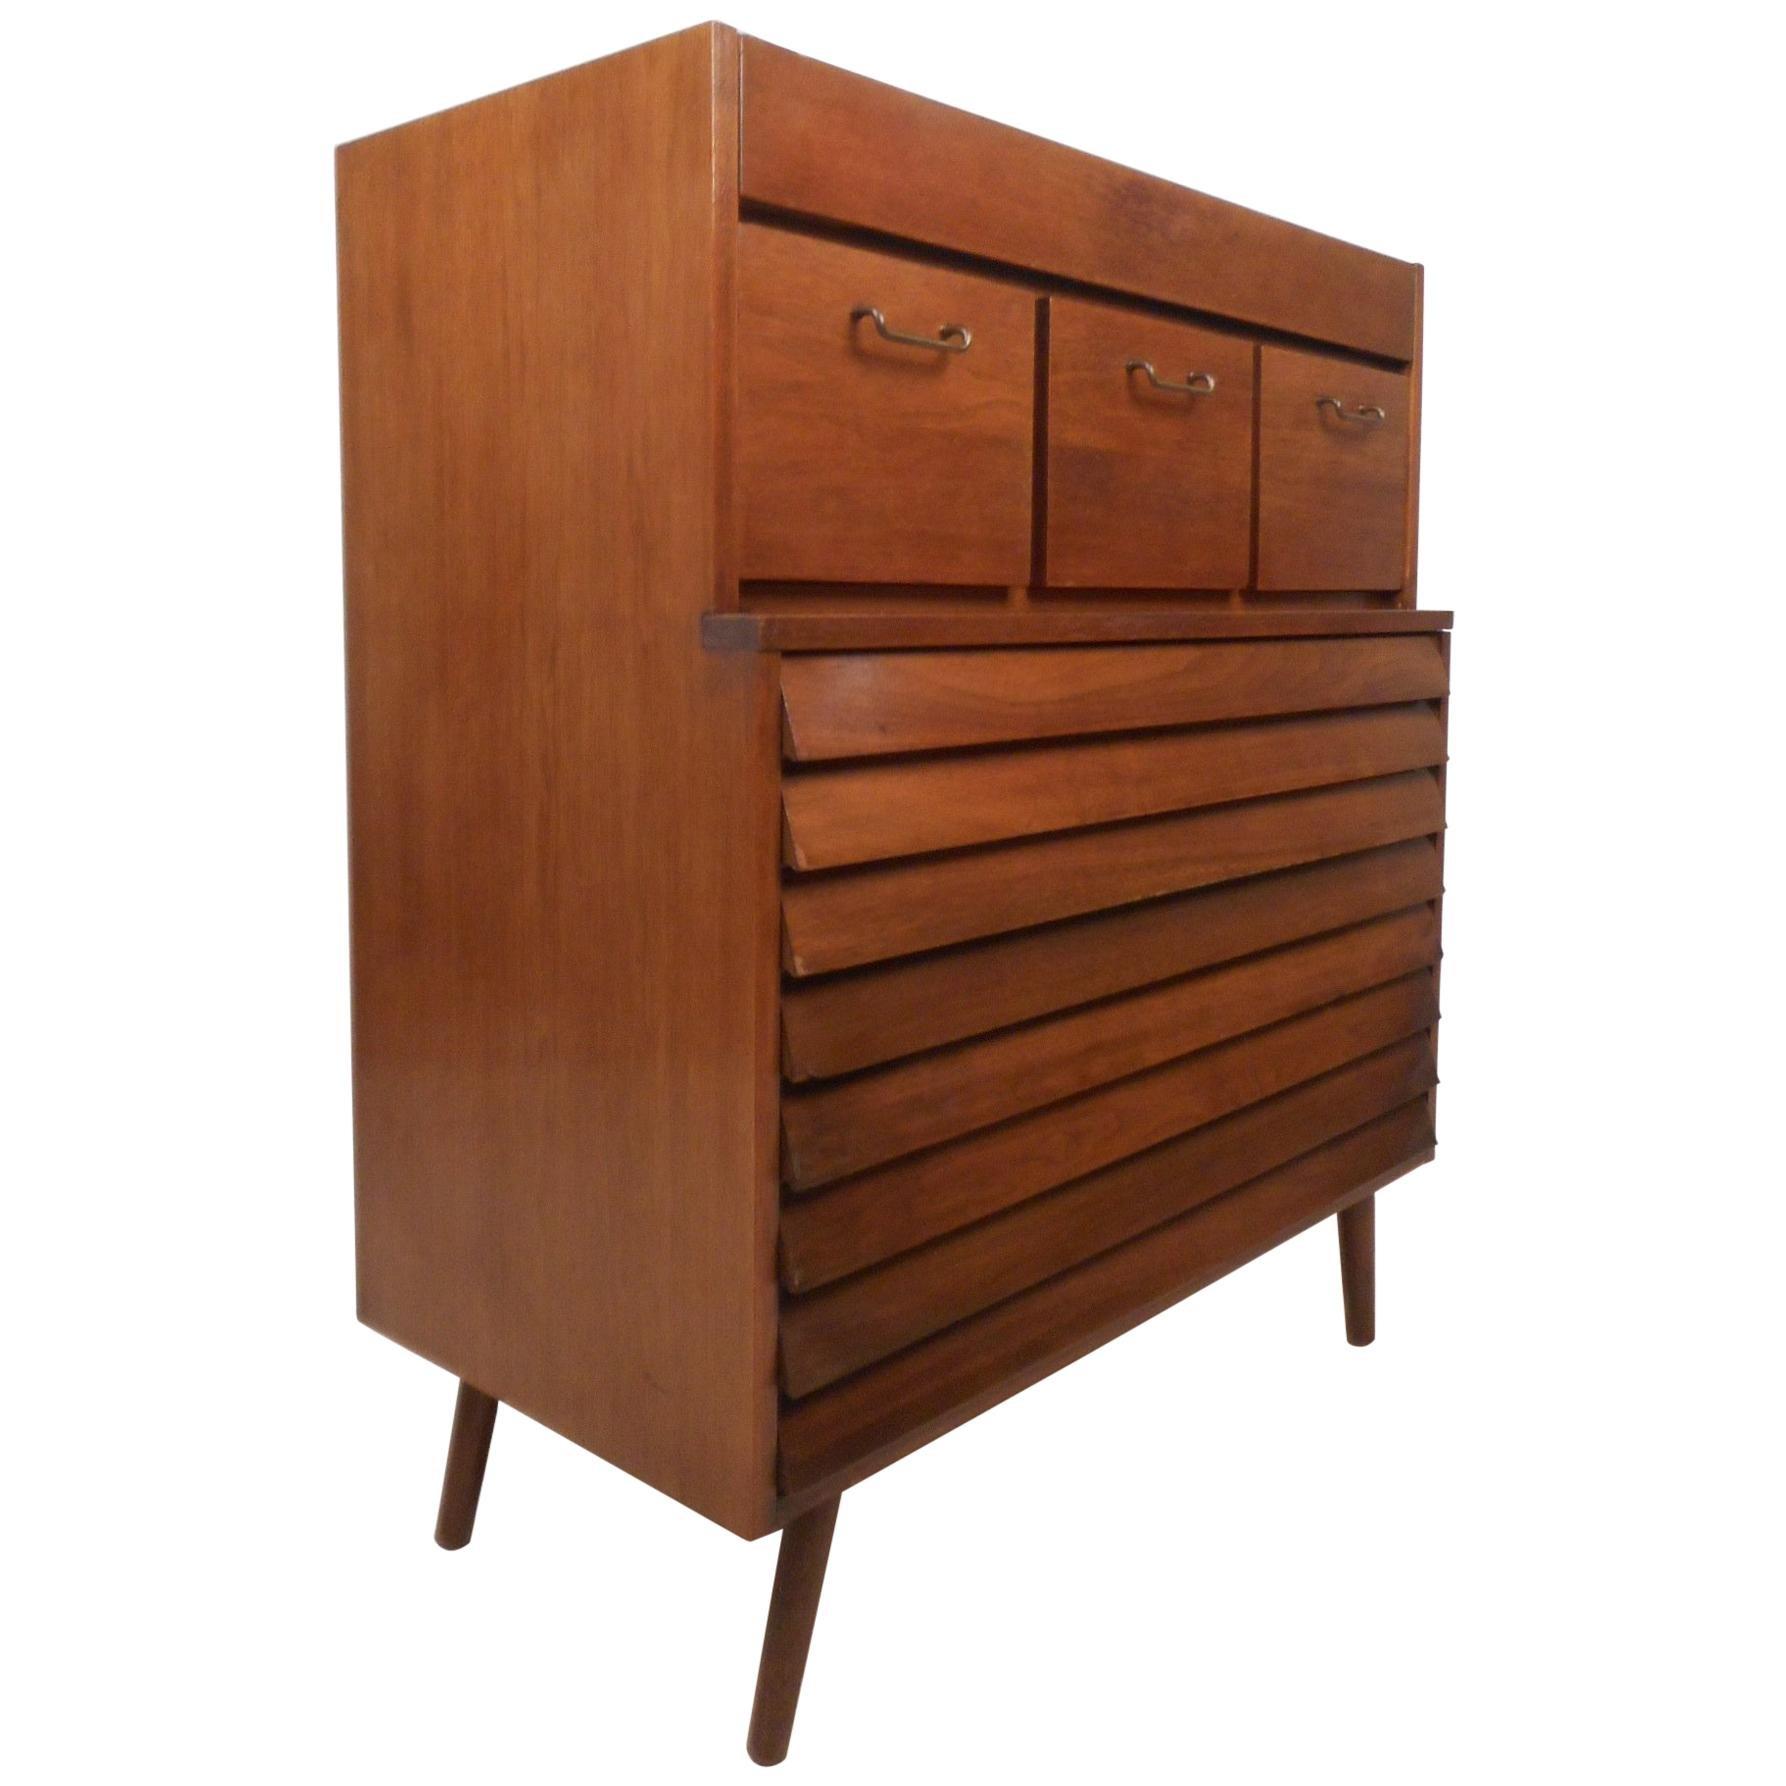 Mid-Century Modern Highboy Dresser by American of Martinsville